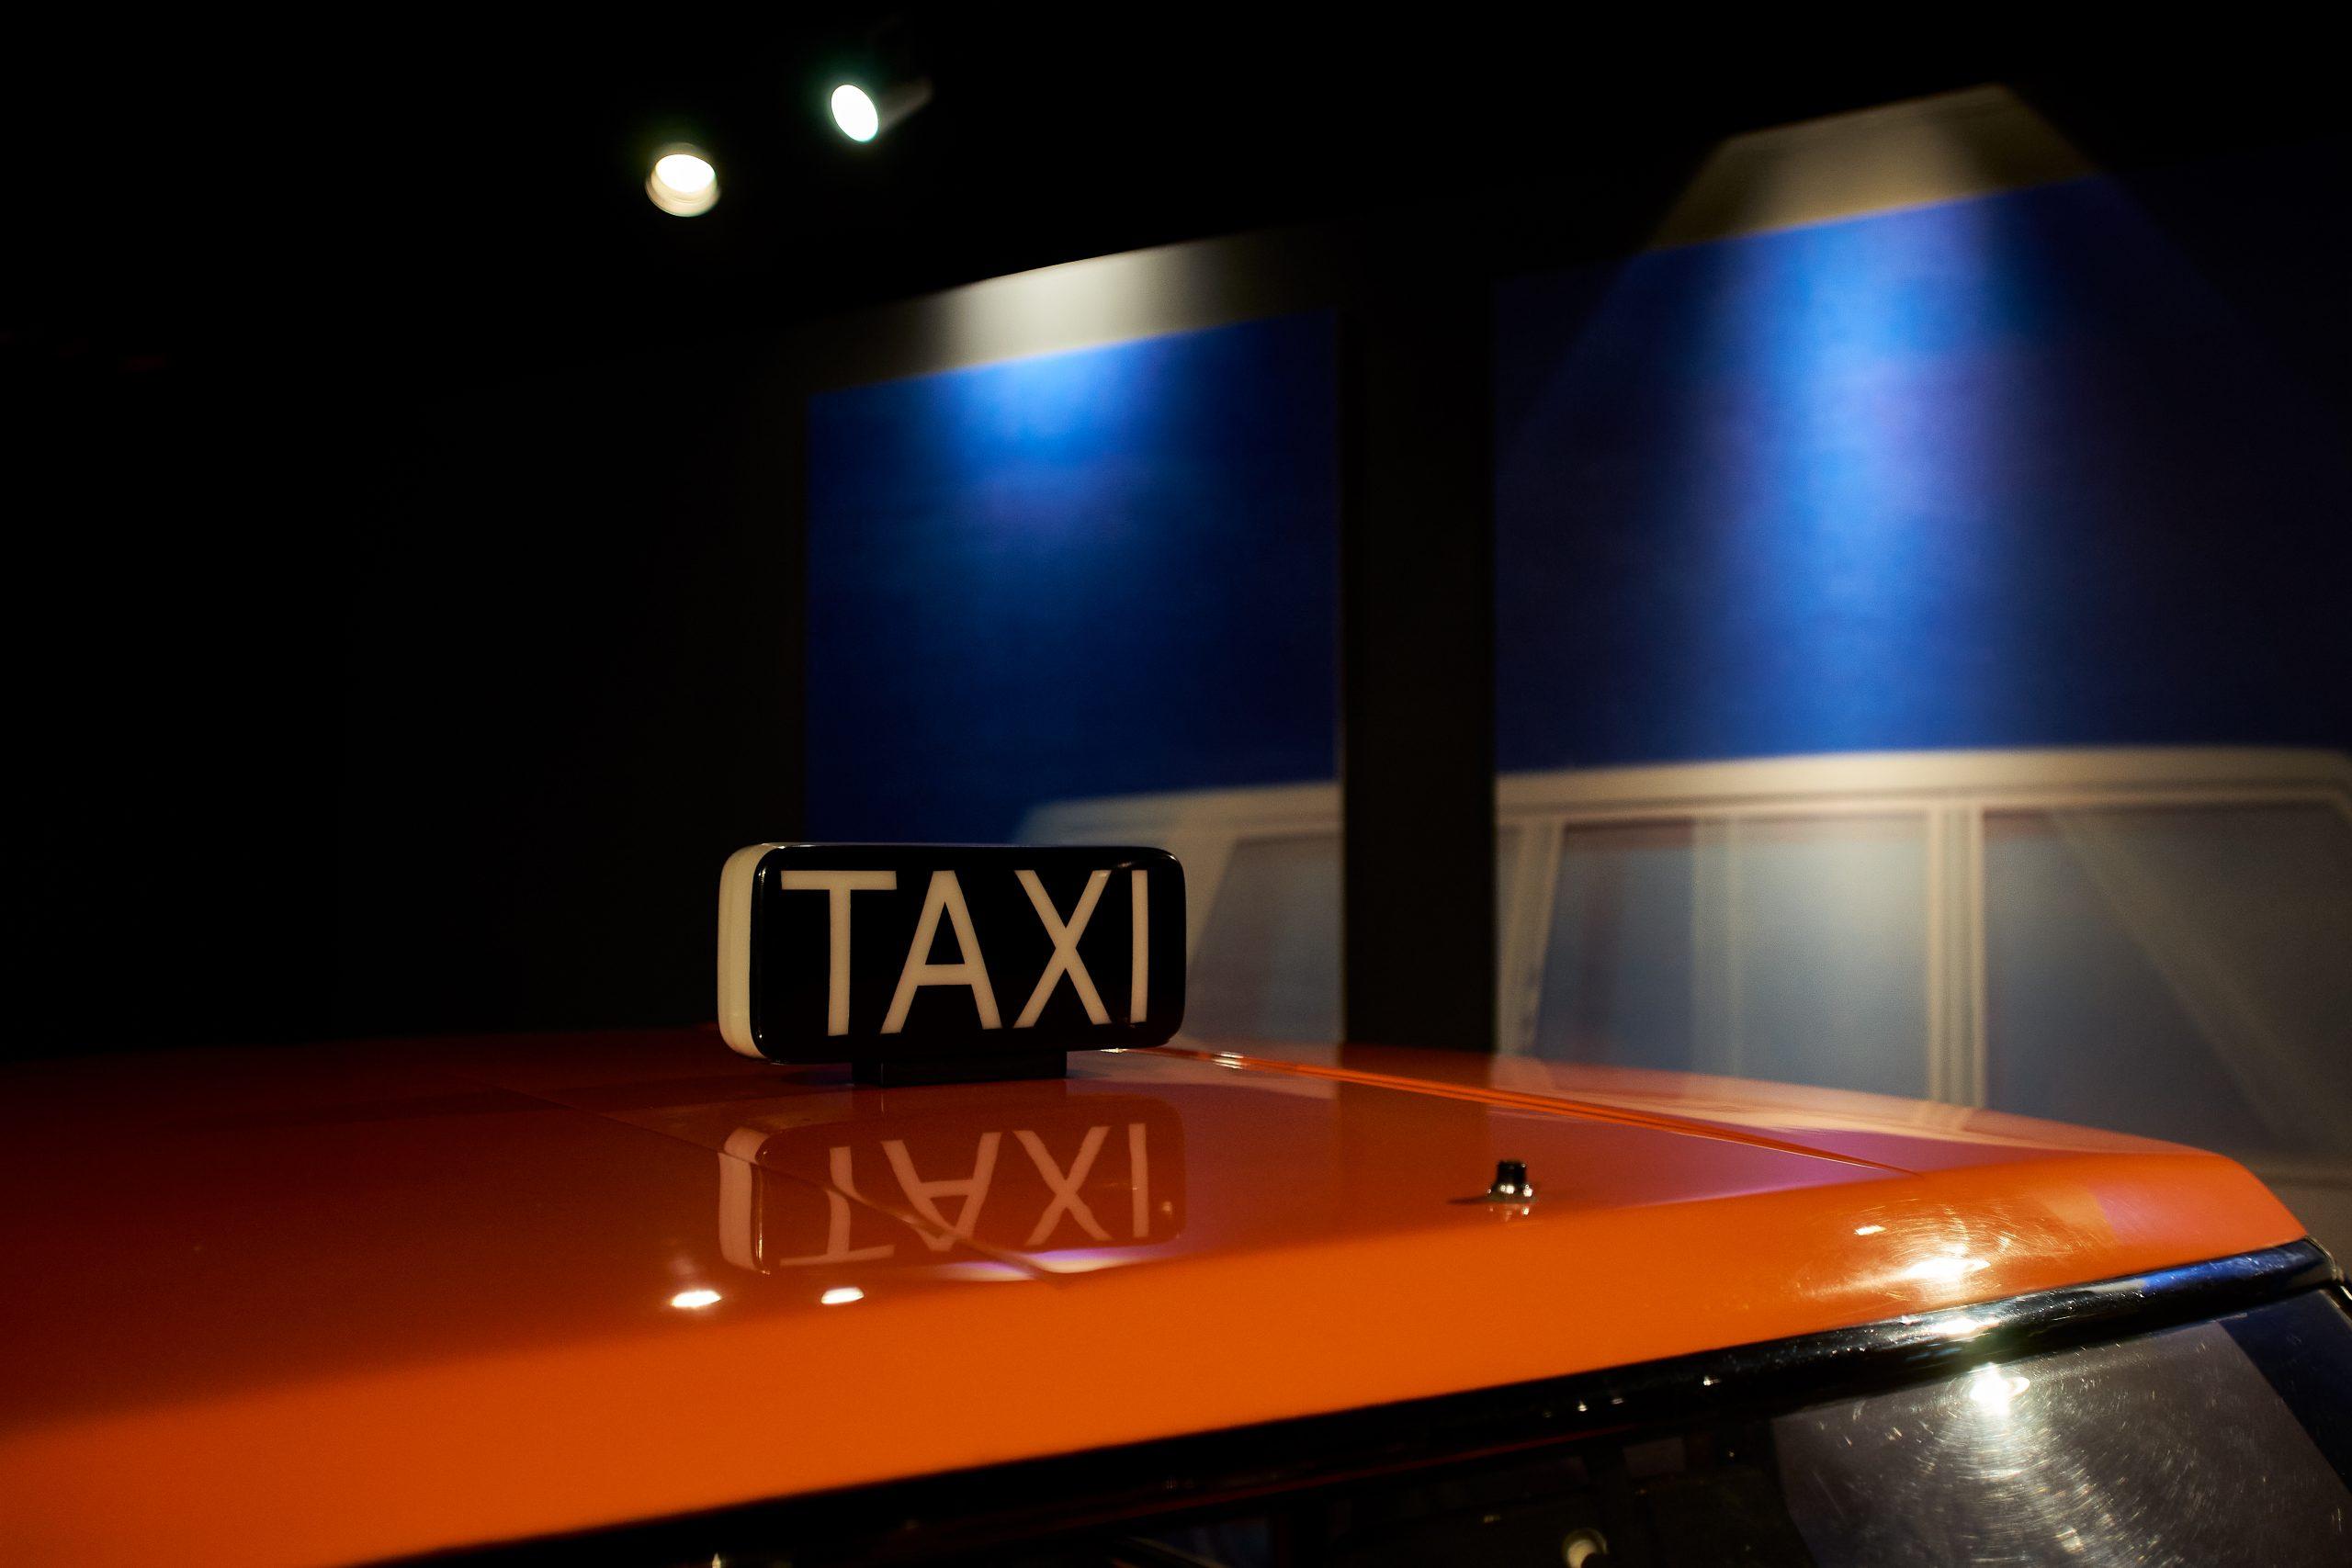 05 Fiat City Taxi scaled H Fiat, o ιδιοφυής σχεδιαστής και ένα περίεργο ταξί Fiat, retro, ειδήσεις, Νέα